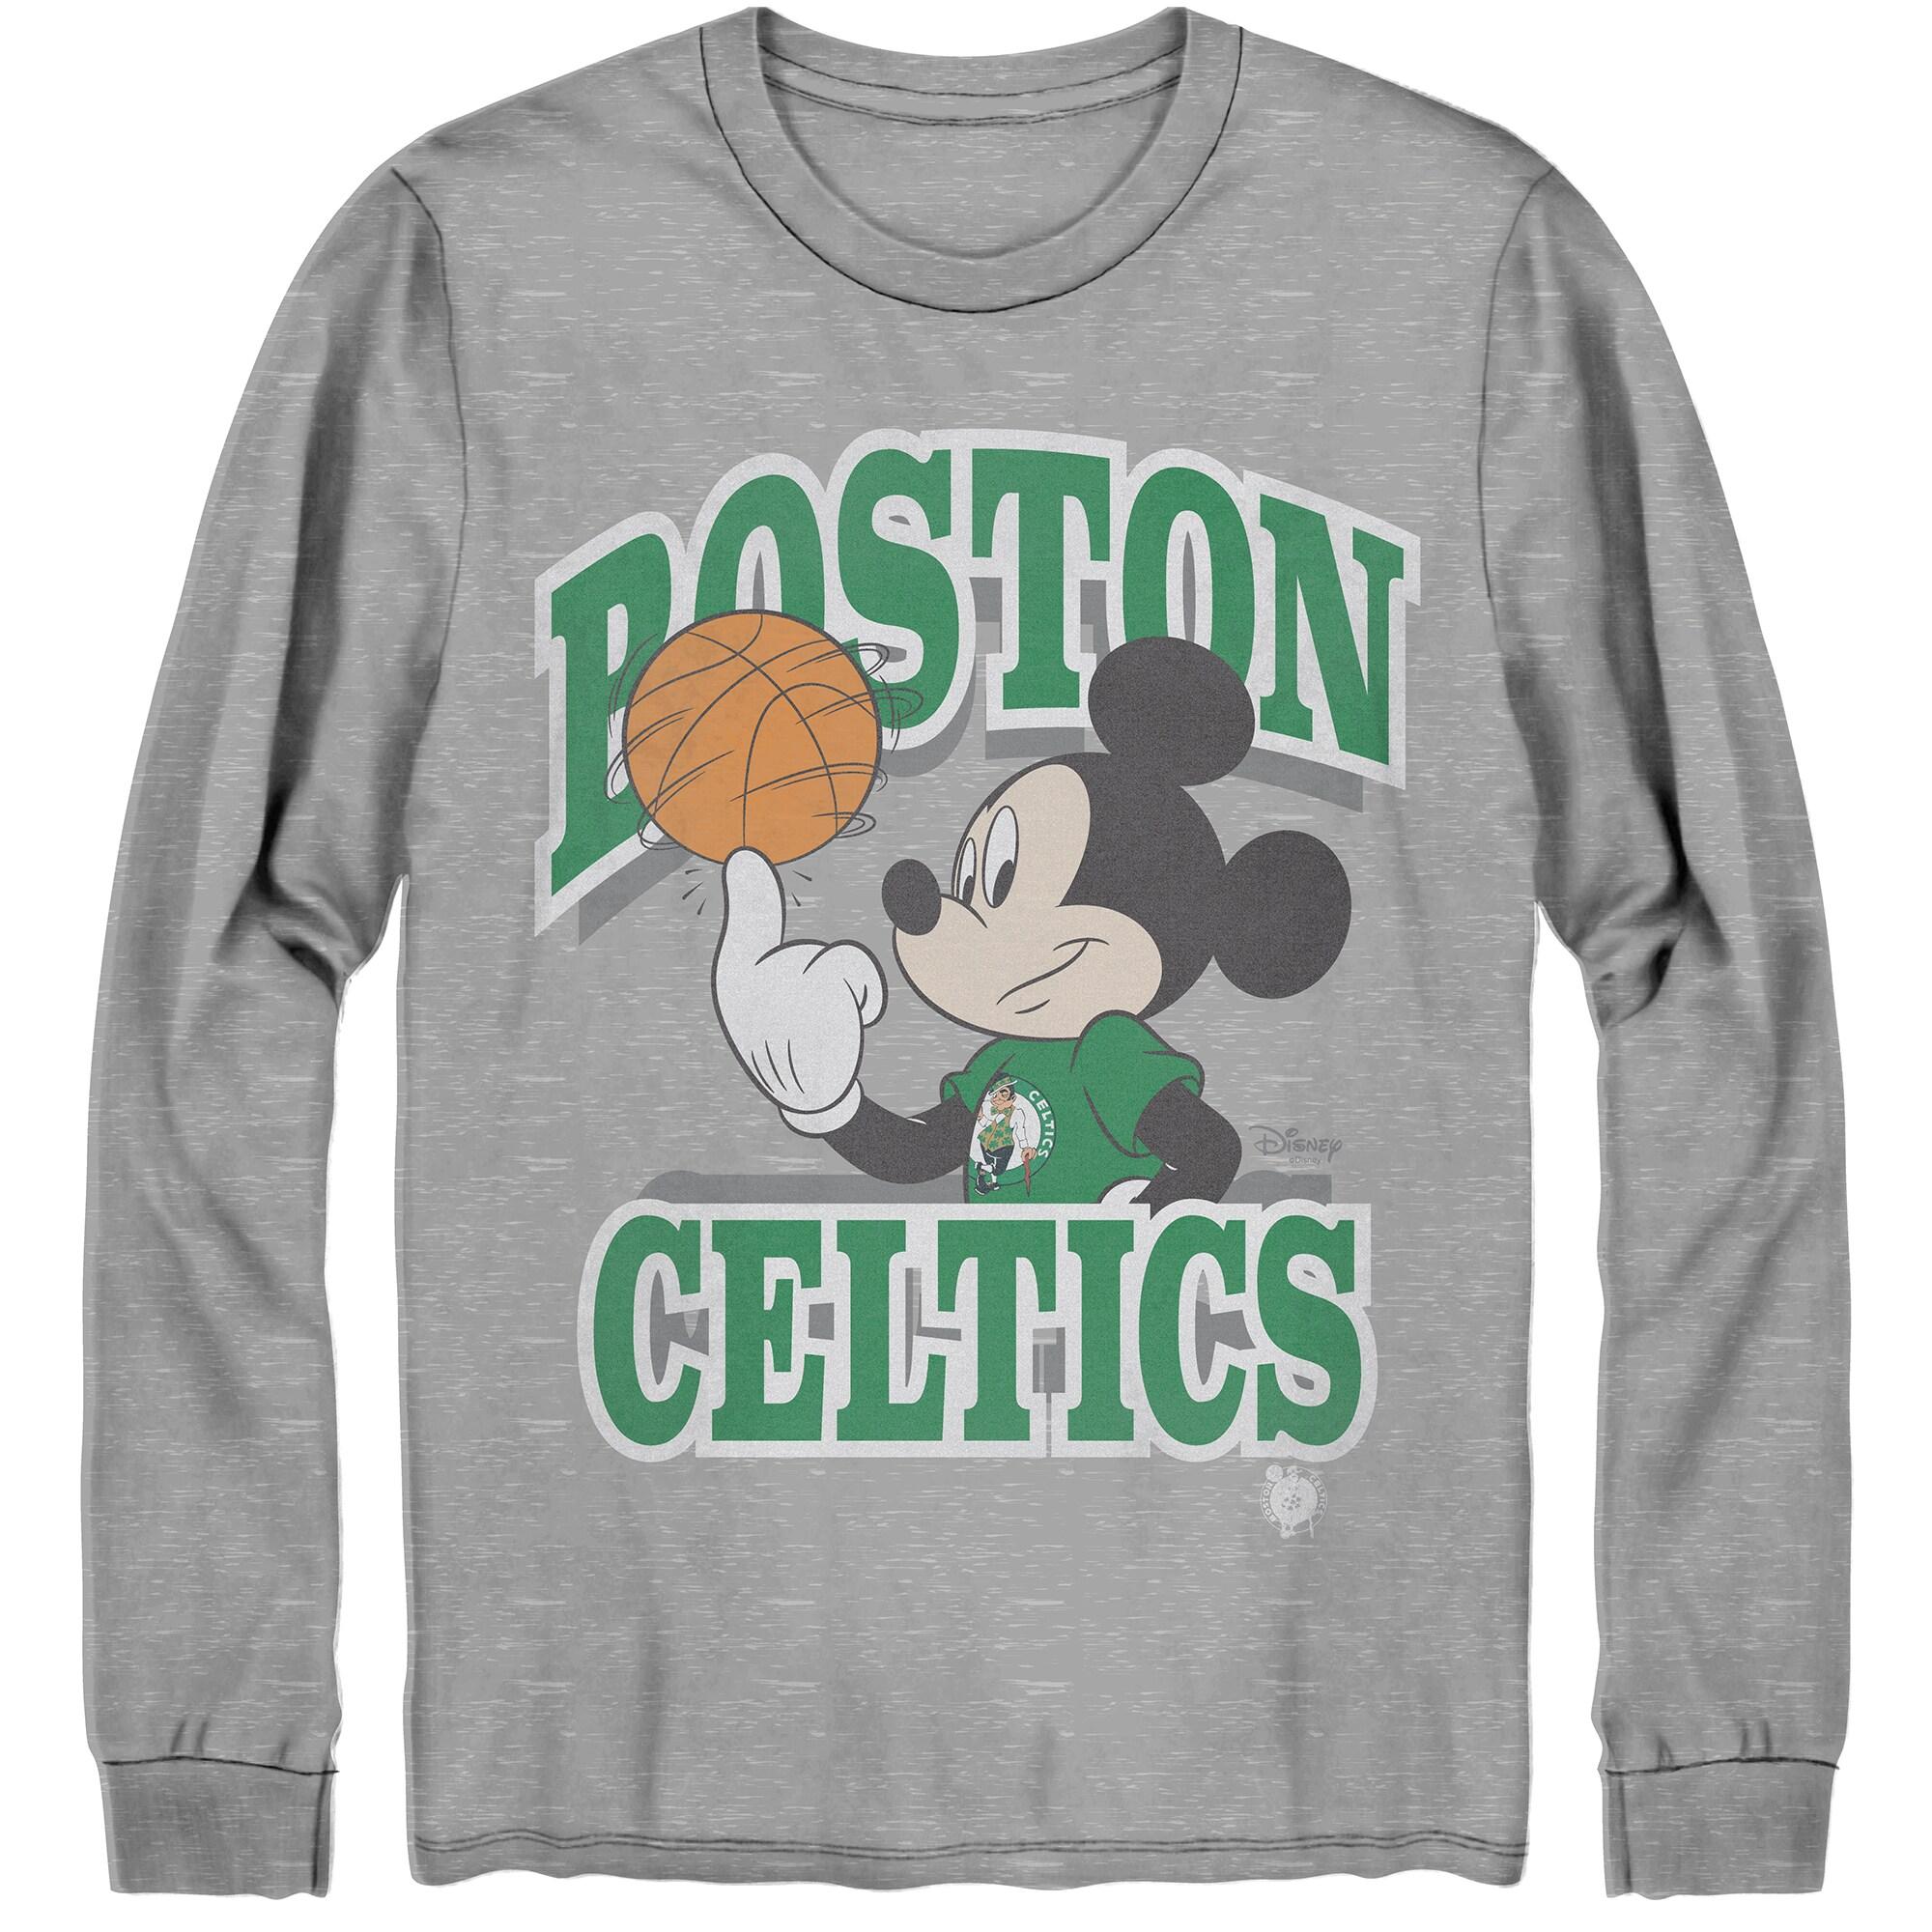 Boston Celtics Junk Food Disney Mickey Team Spirit Long Sleeve T-Shirt - Gray